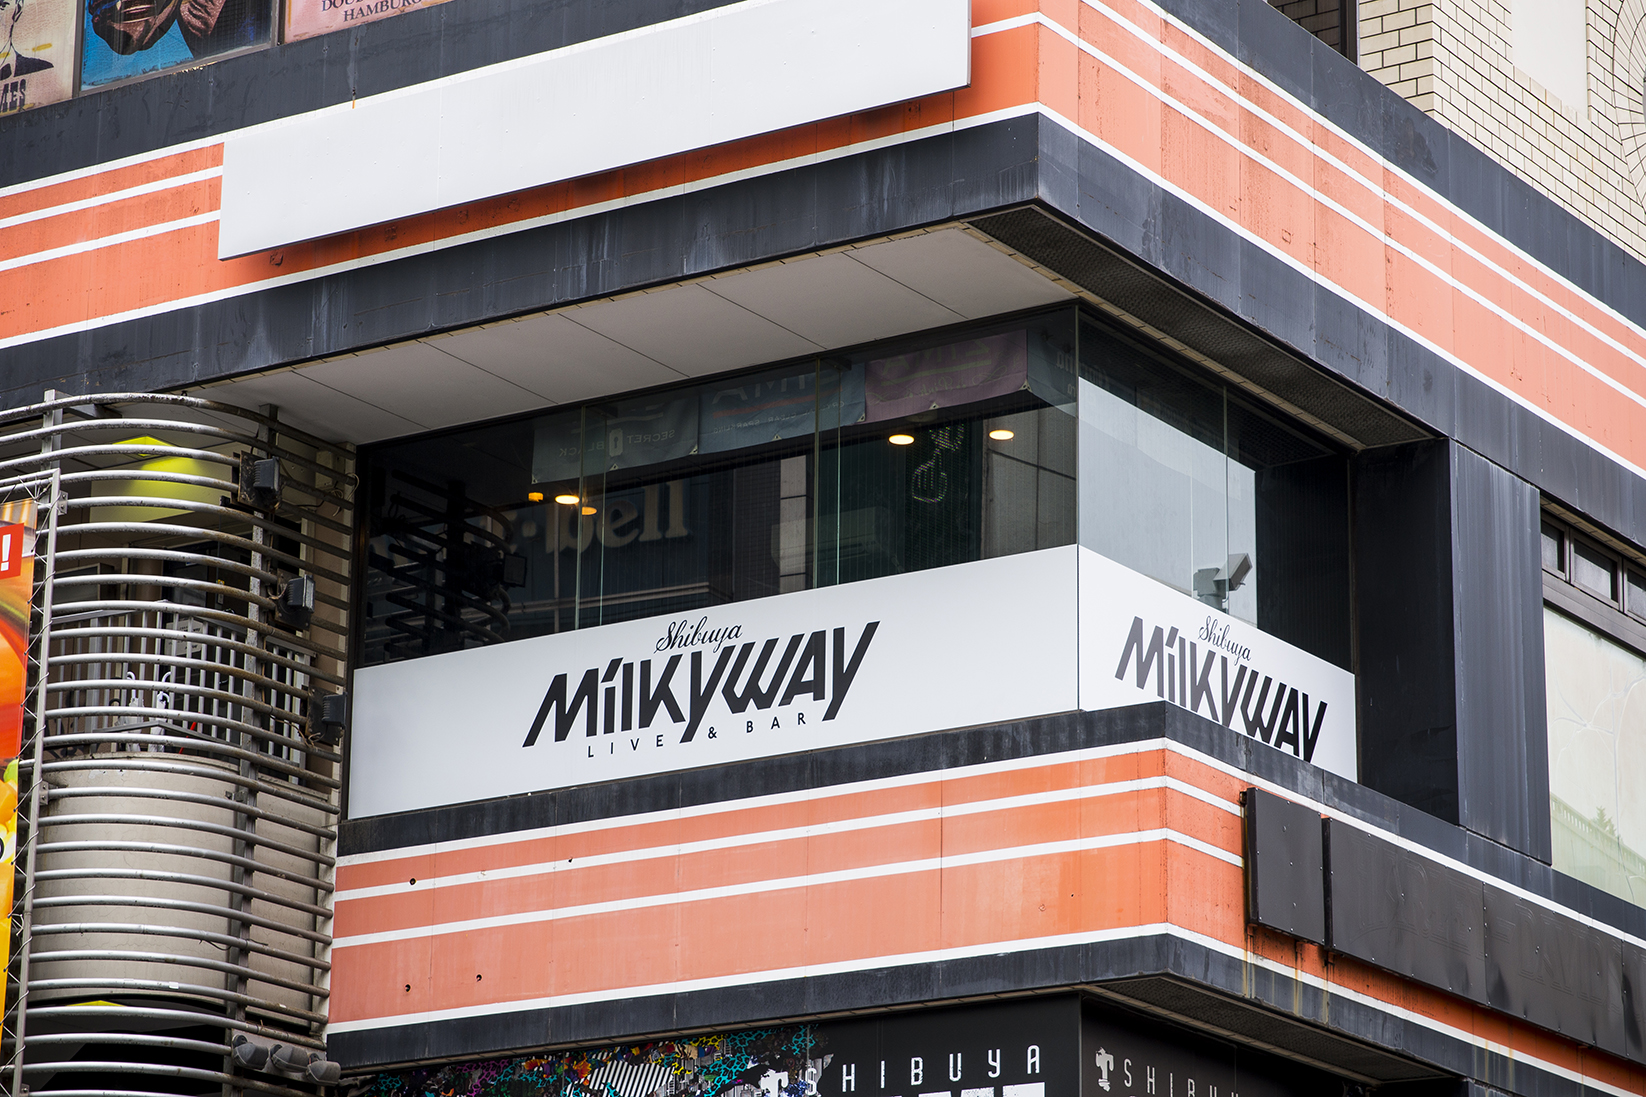 Shibuya Milkyway